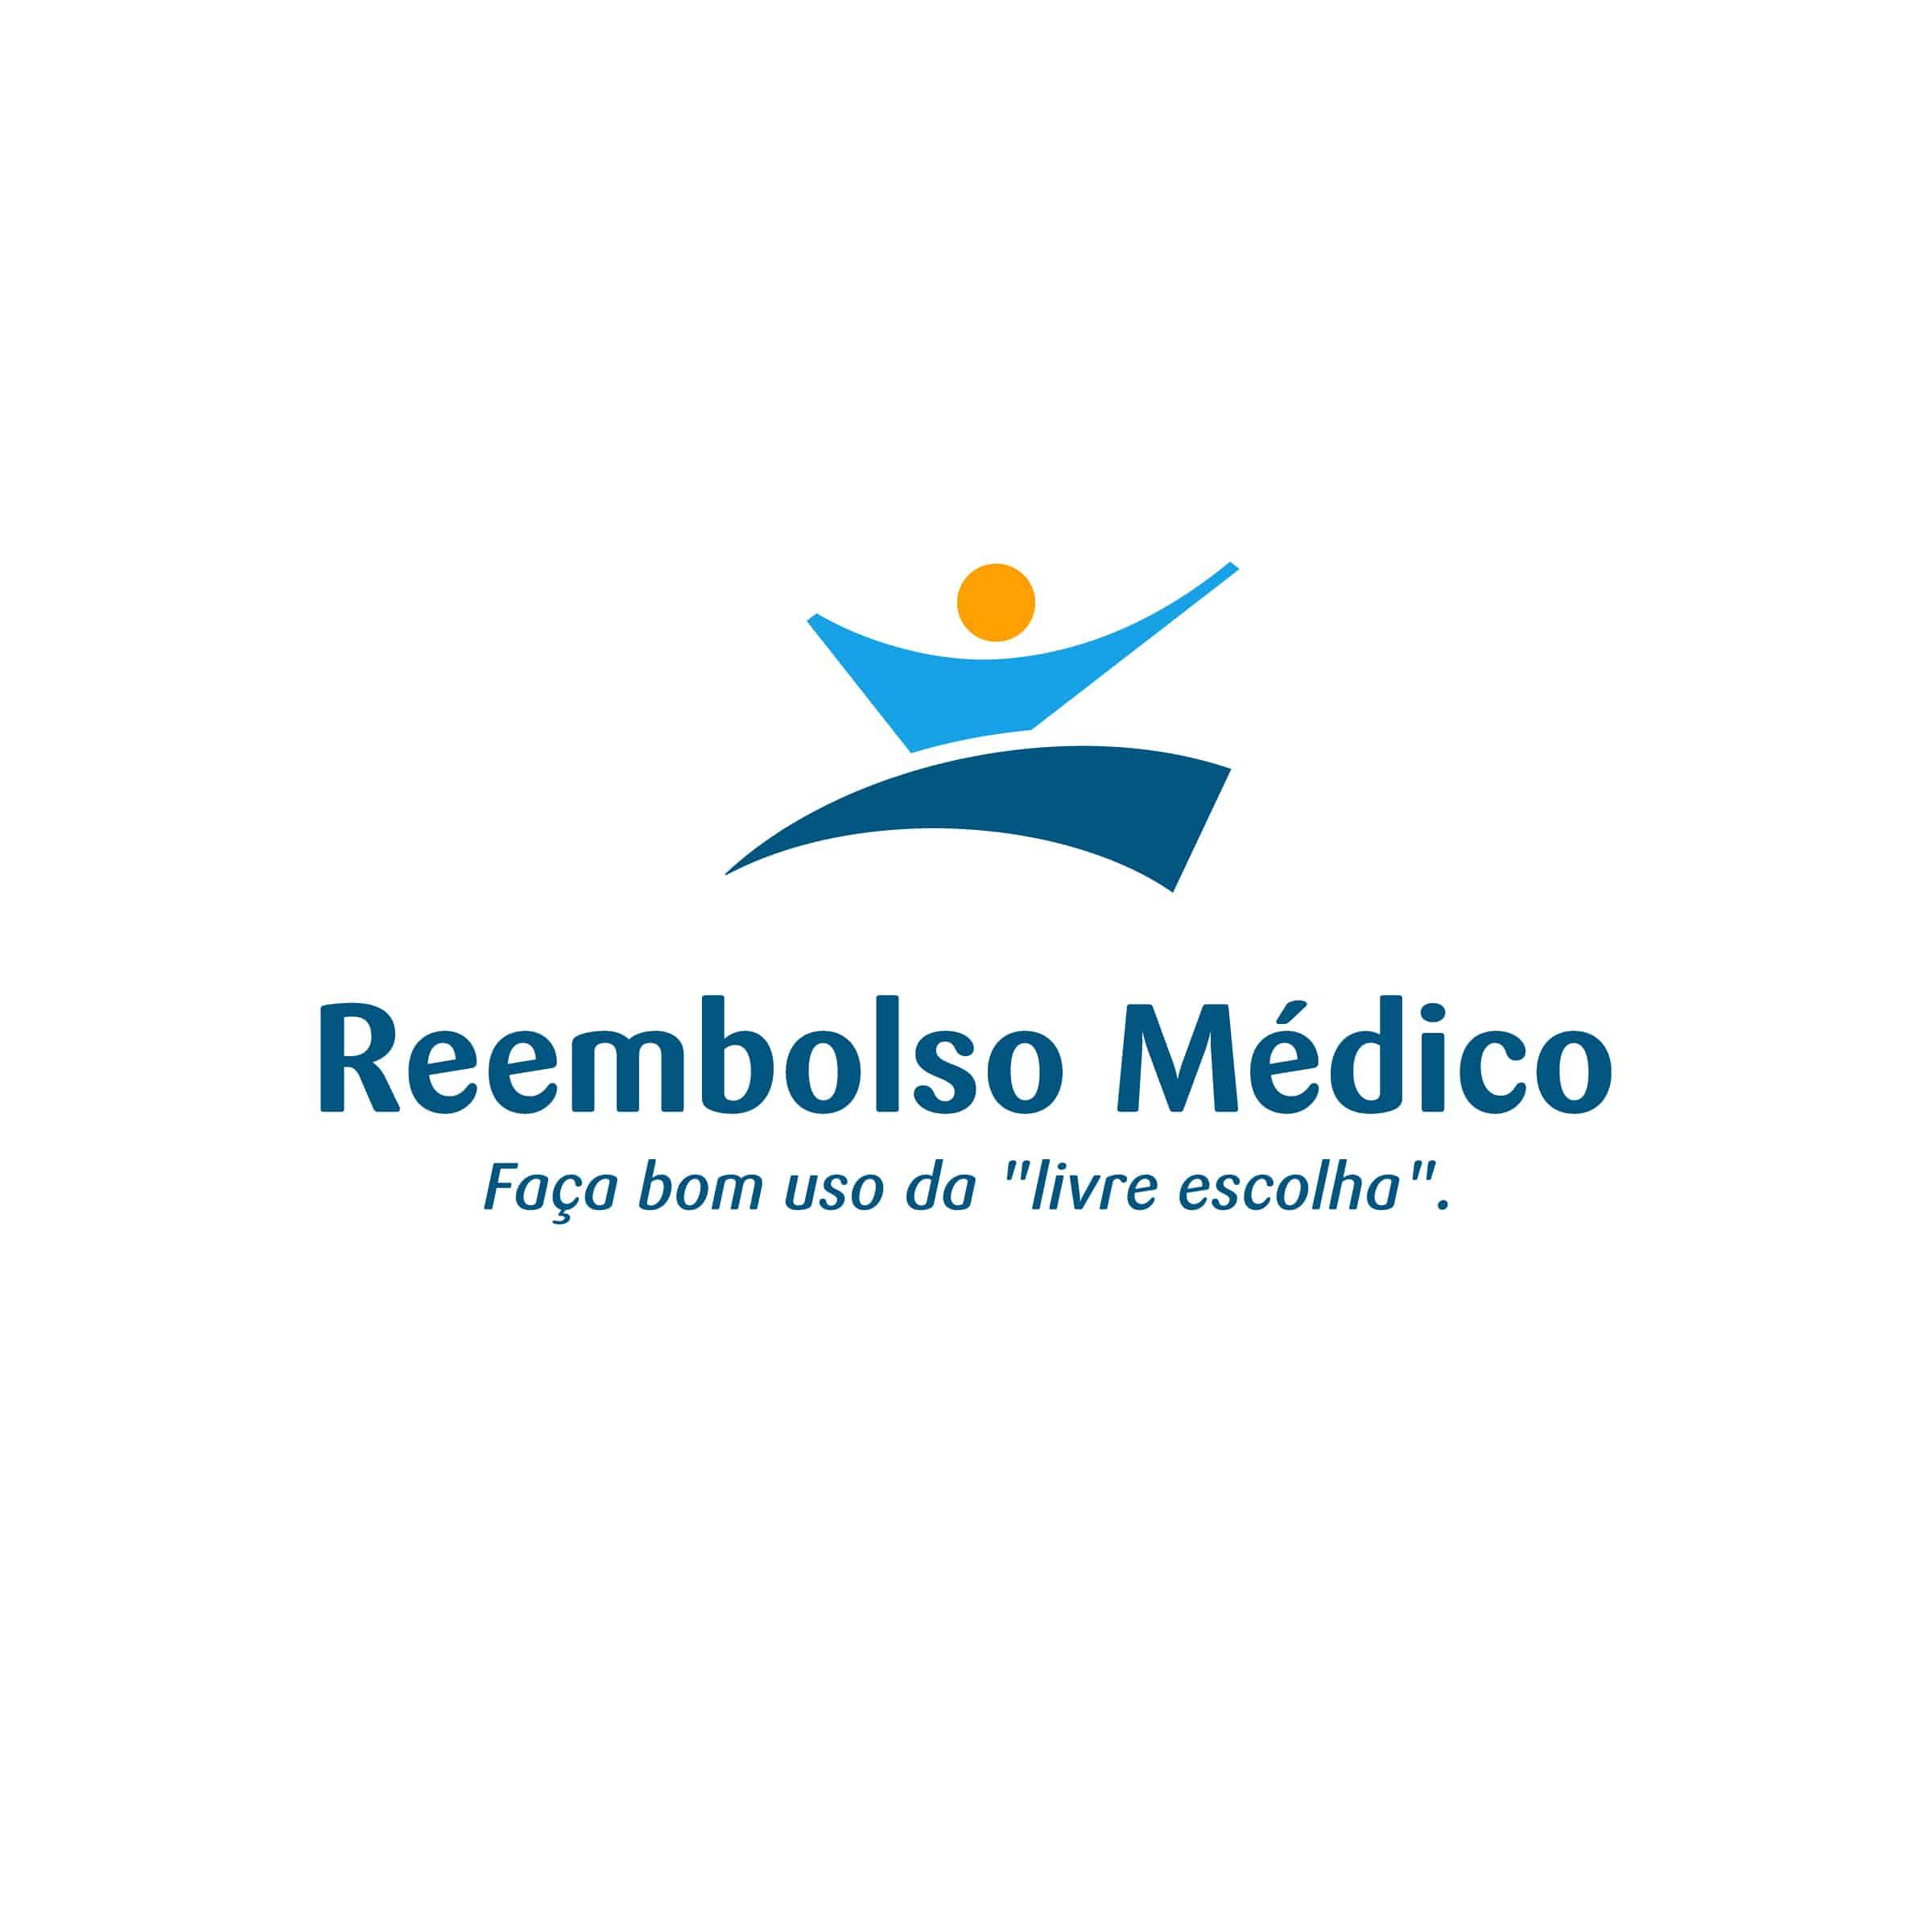 Reembolso médico